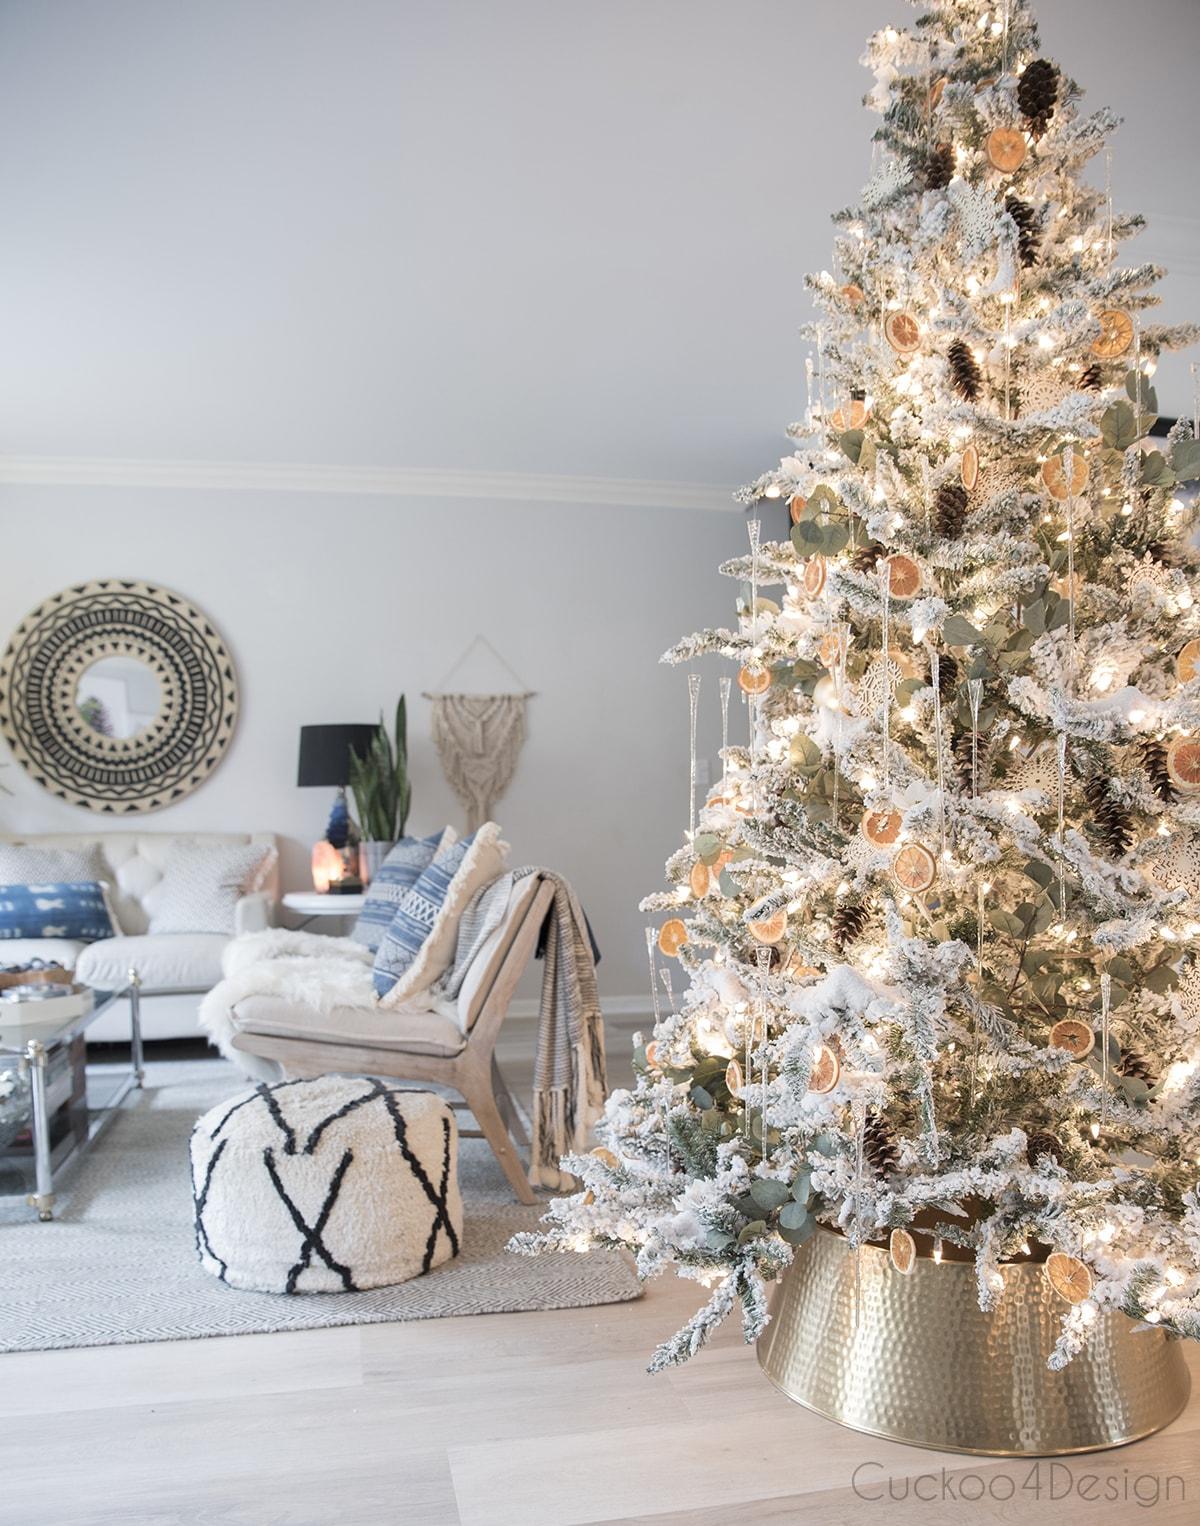 view of German Christmas tree facing the living room